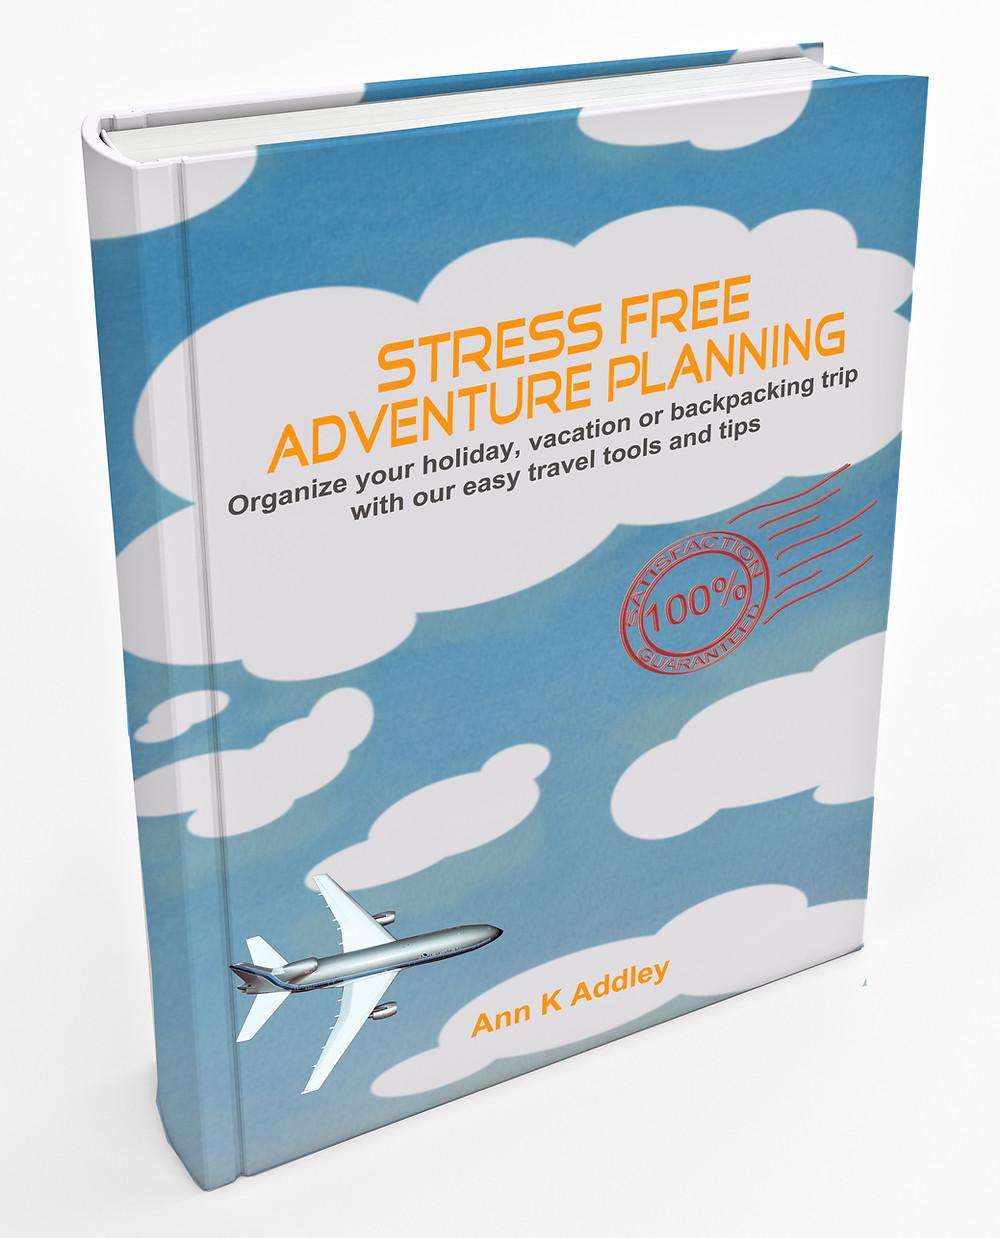 Stress Free Adventure Planning